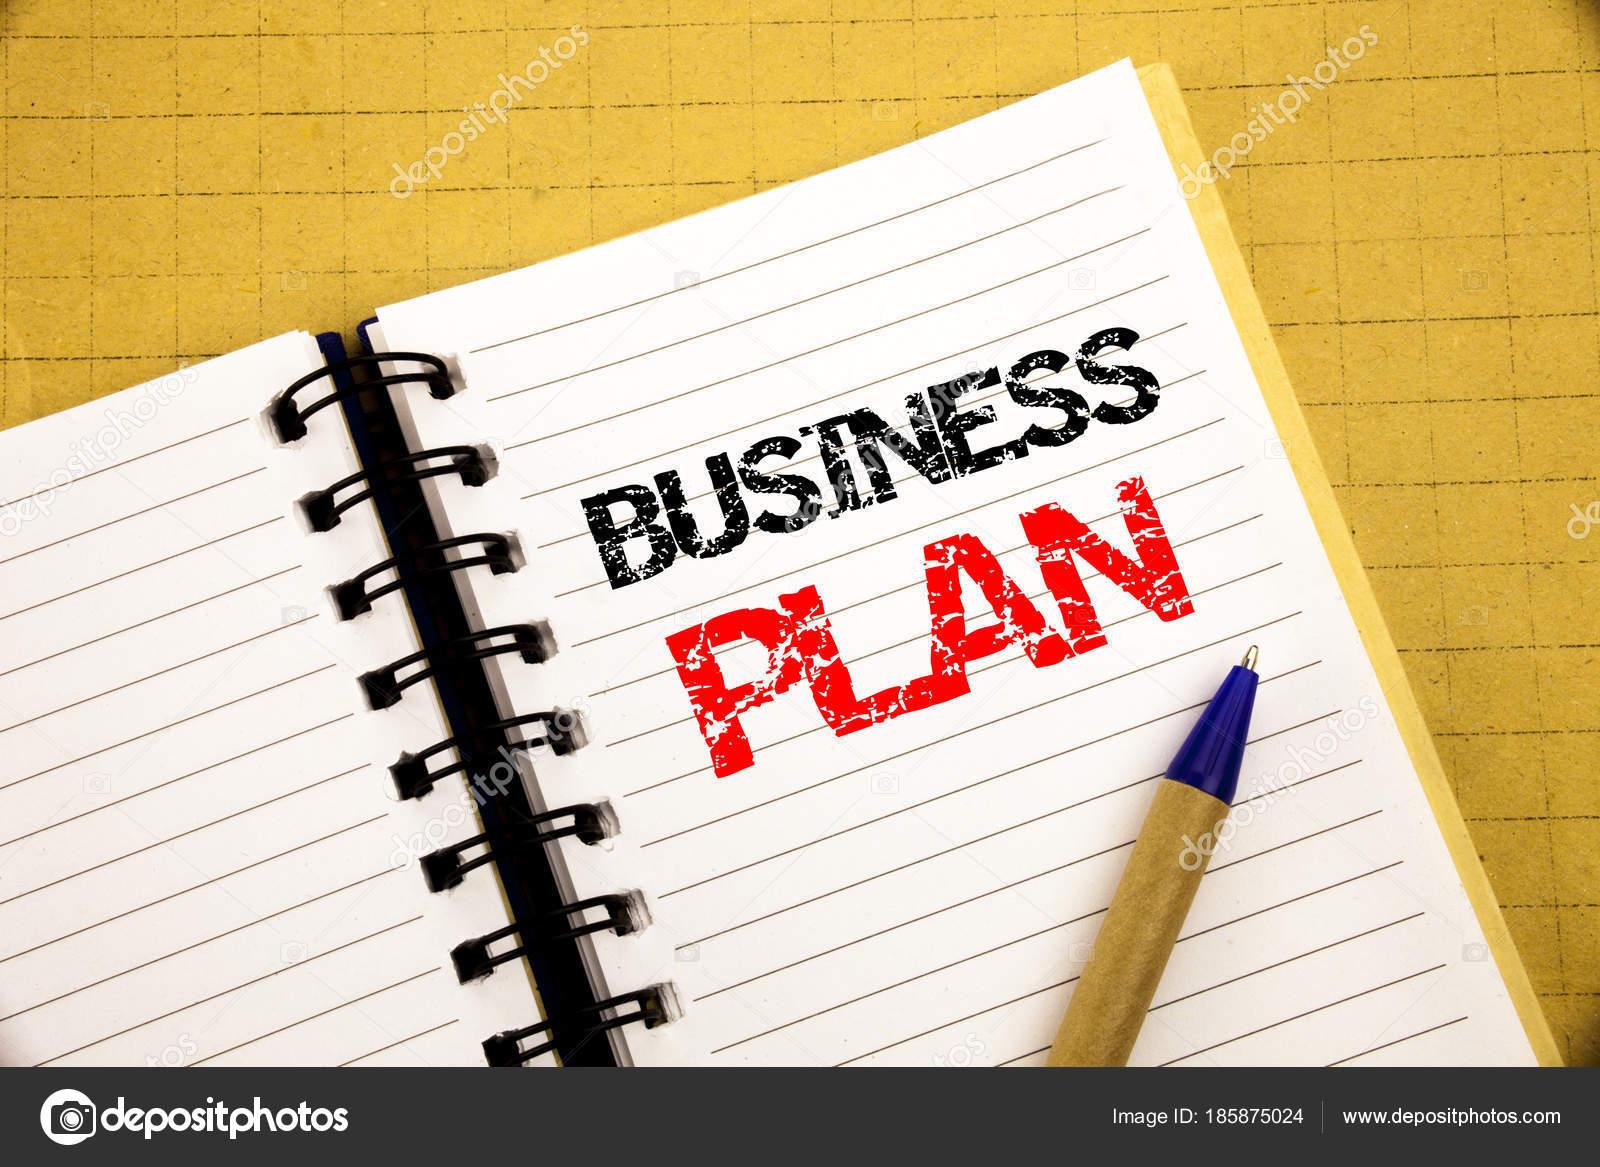 Бизнес план миссия видение бизнес план процедурного кабинета